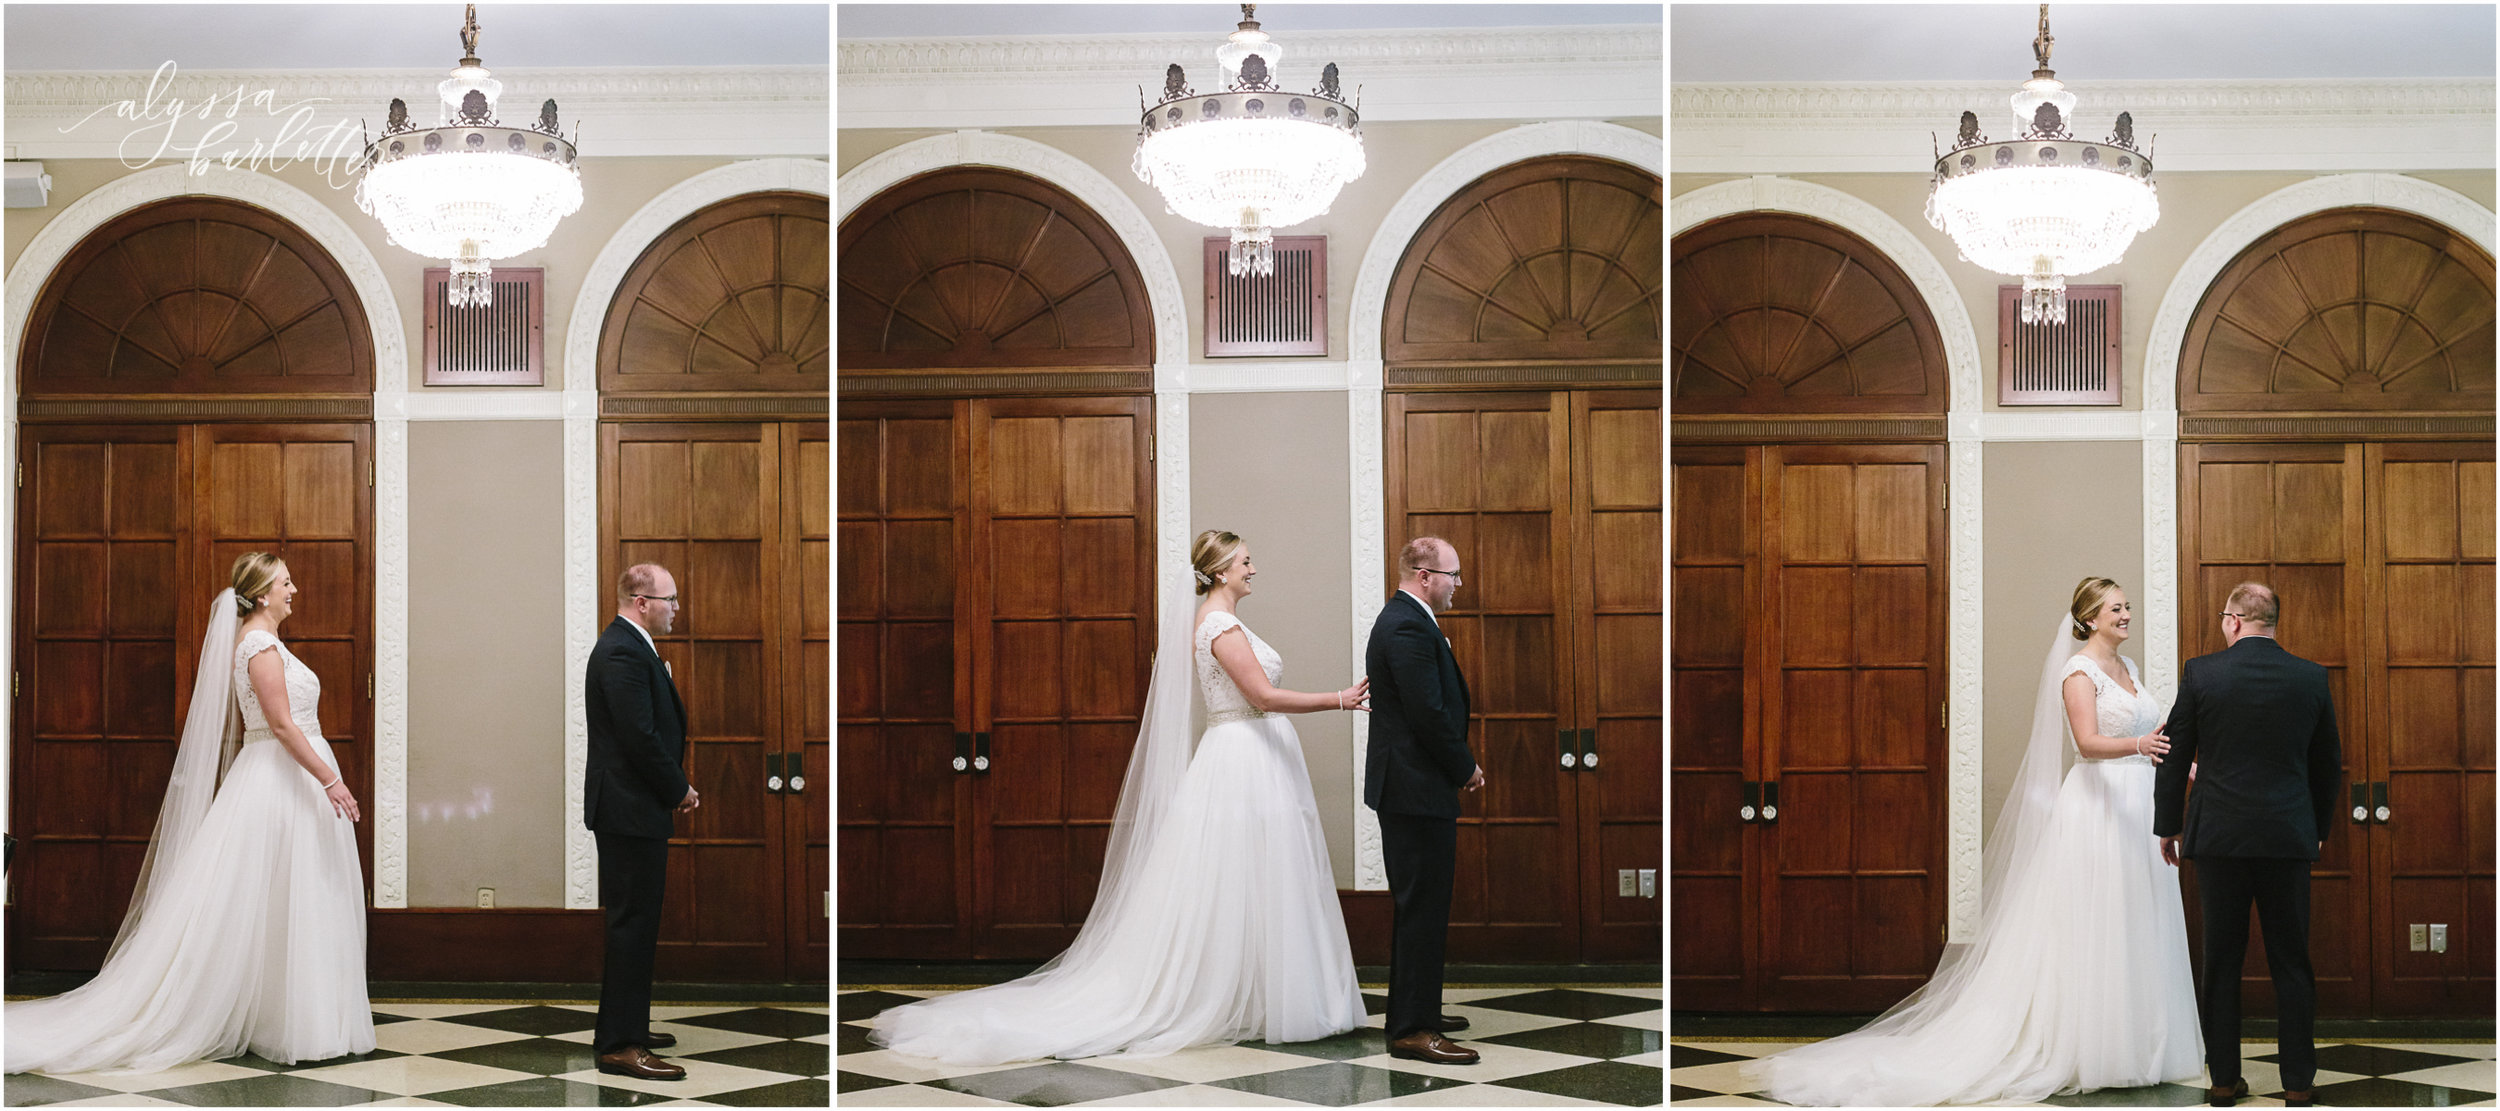 alyssa barletter photography cider gallery lawrence kansas rainy day wedding megan and brett-1-13.jpg